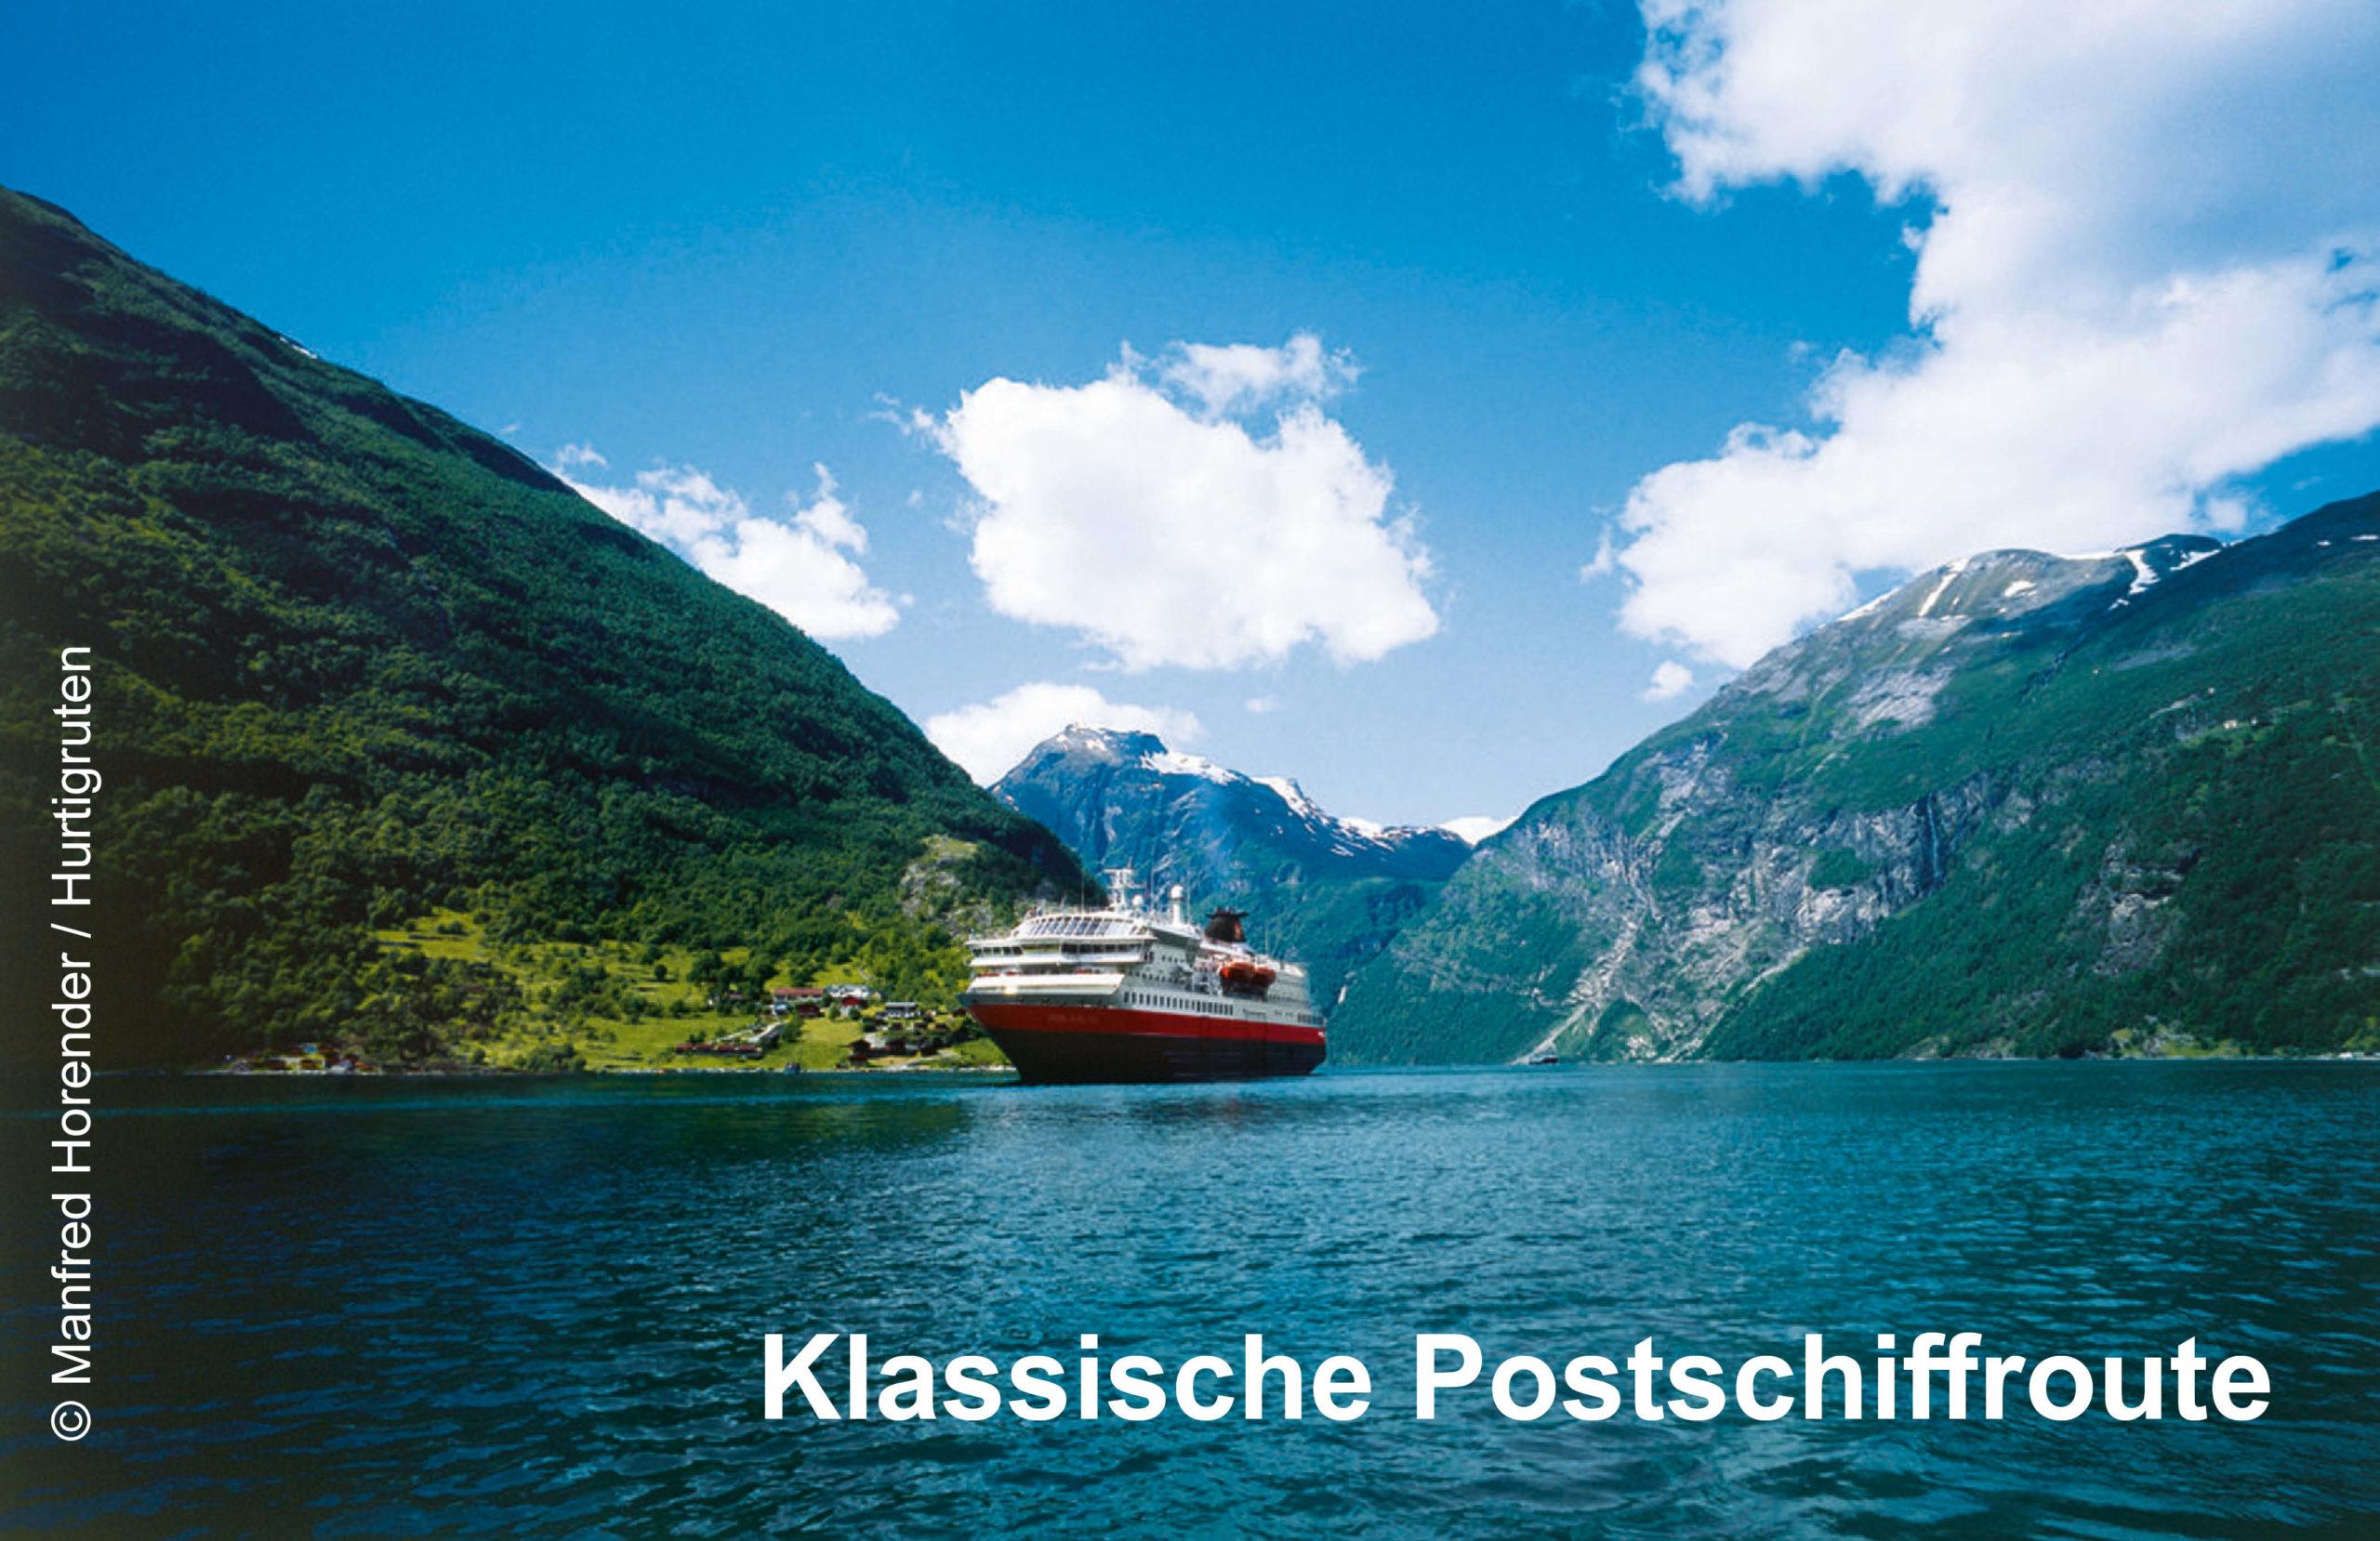 Hurtigruten Klassische Postschiffroute